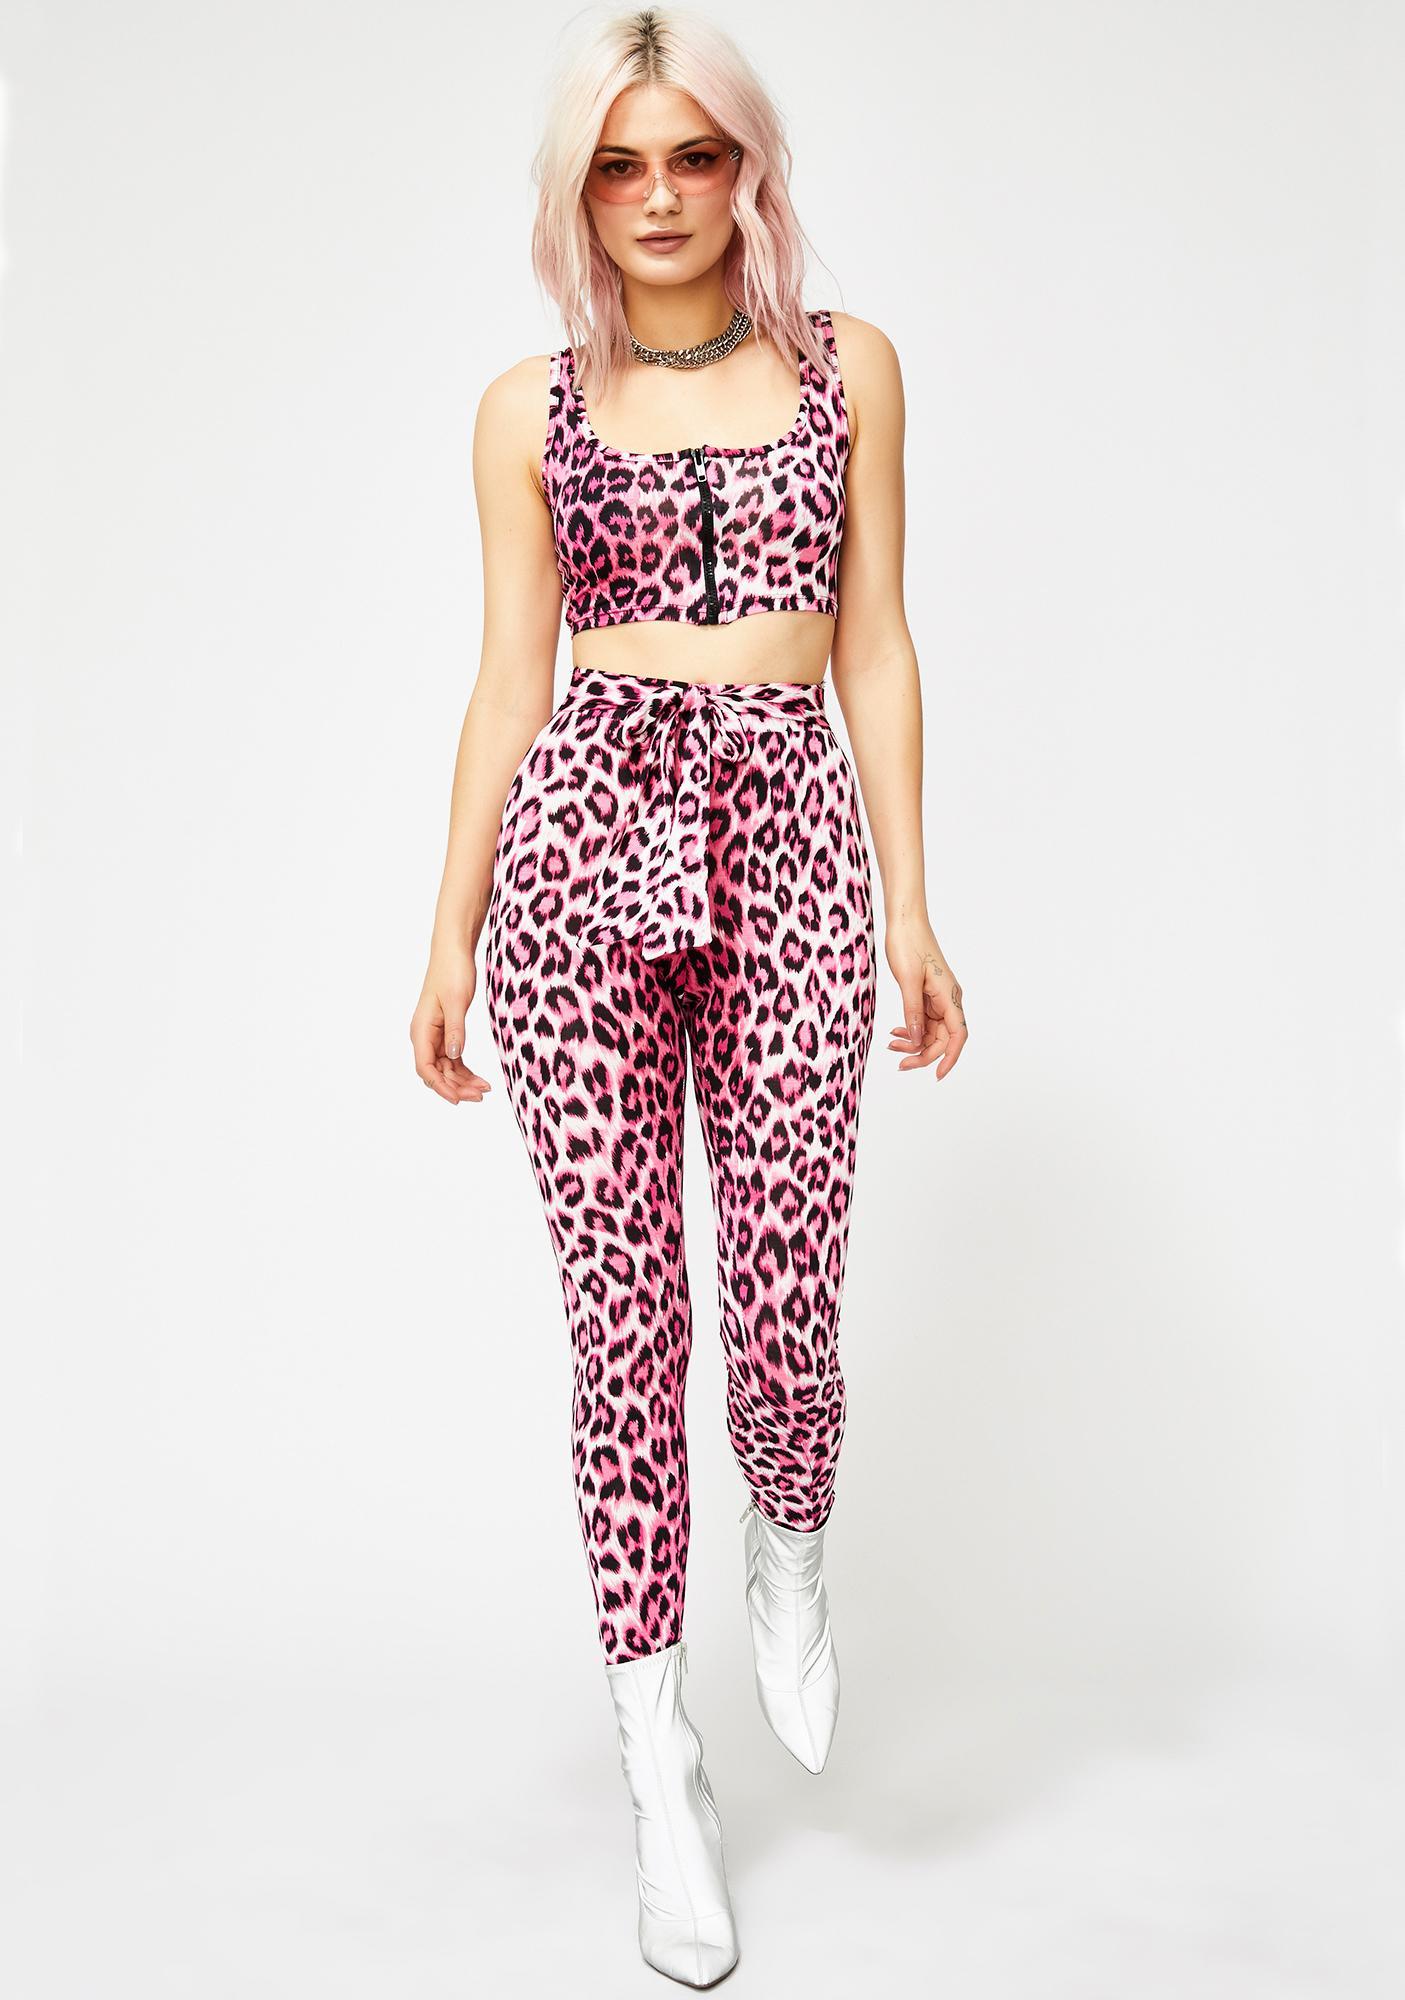 Electrik Kitty Leopard Set